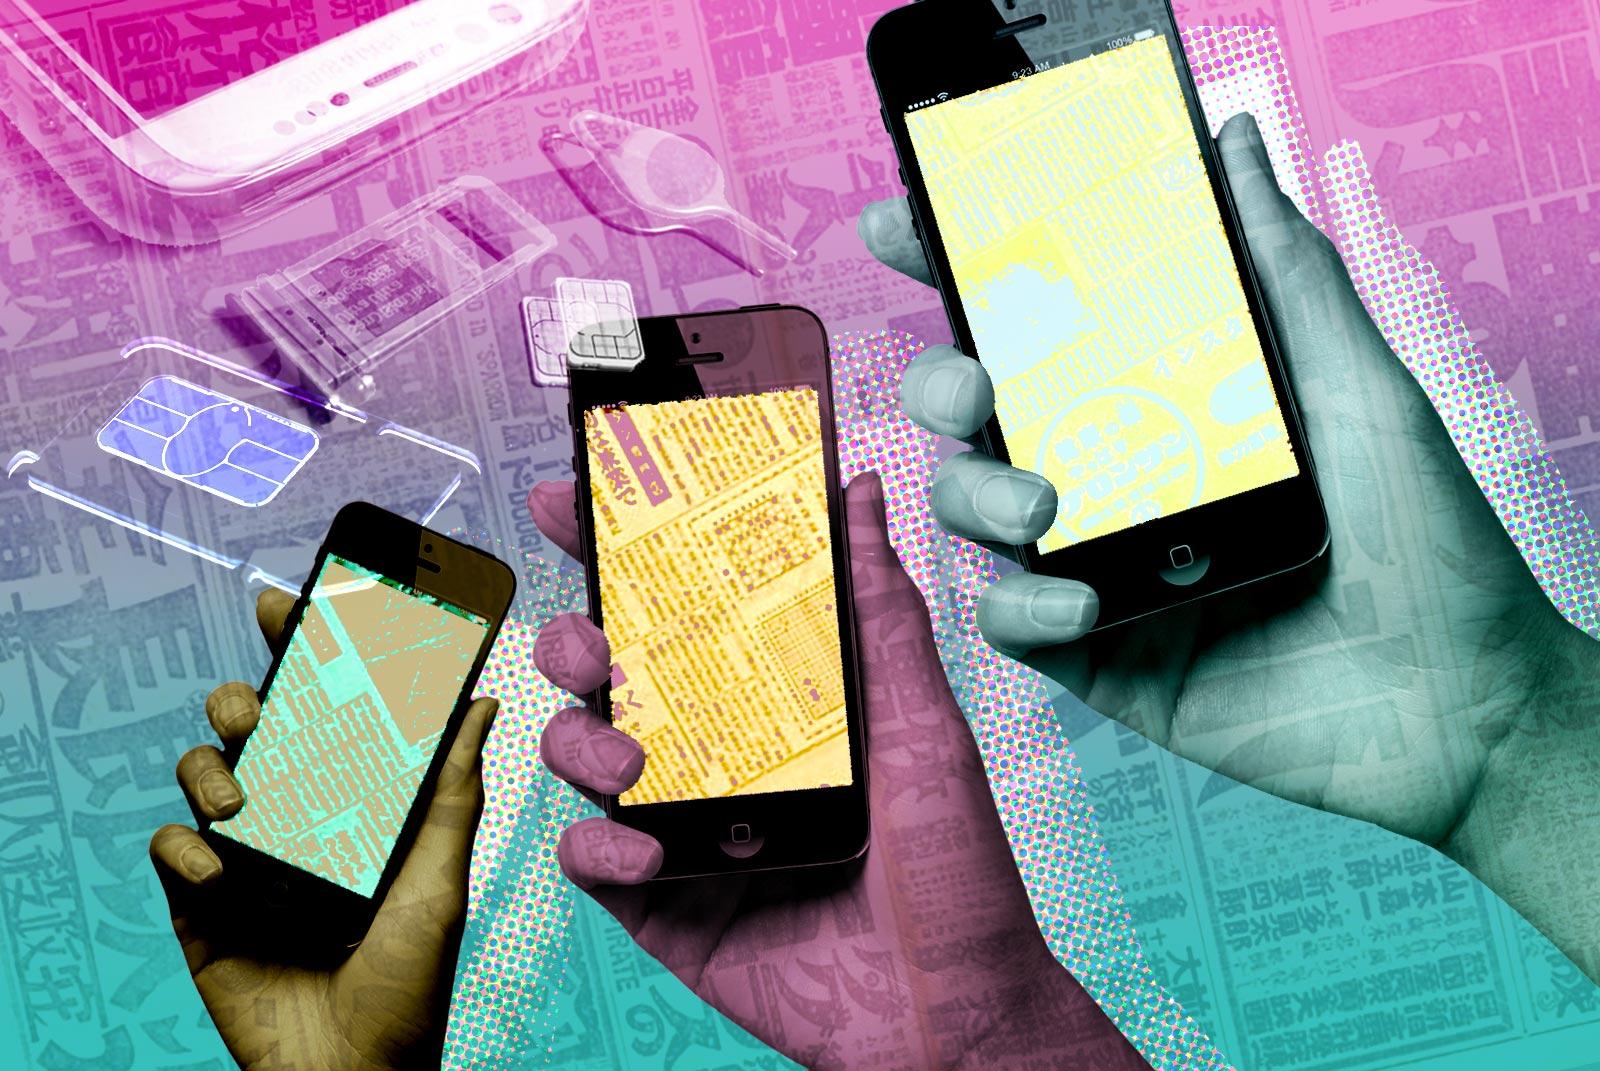 How to Get a Smartphone - GaijinPot